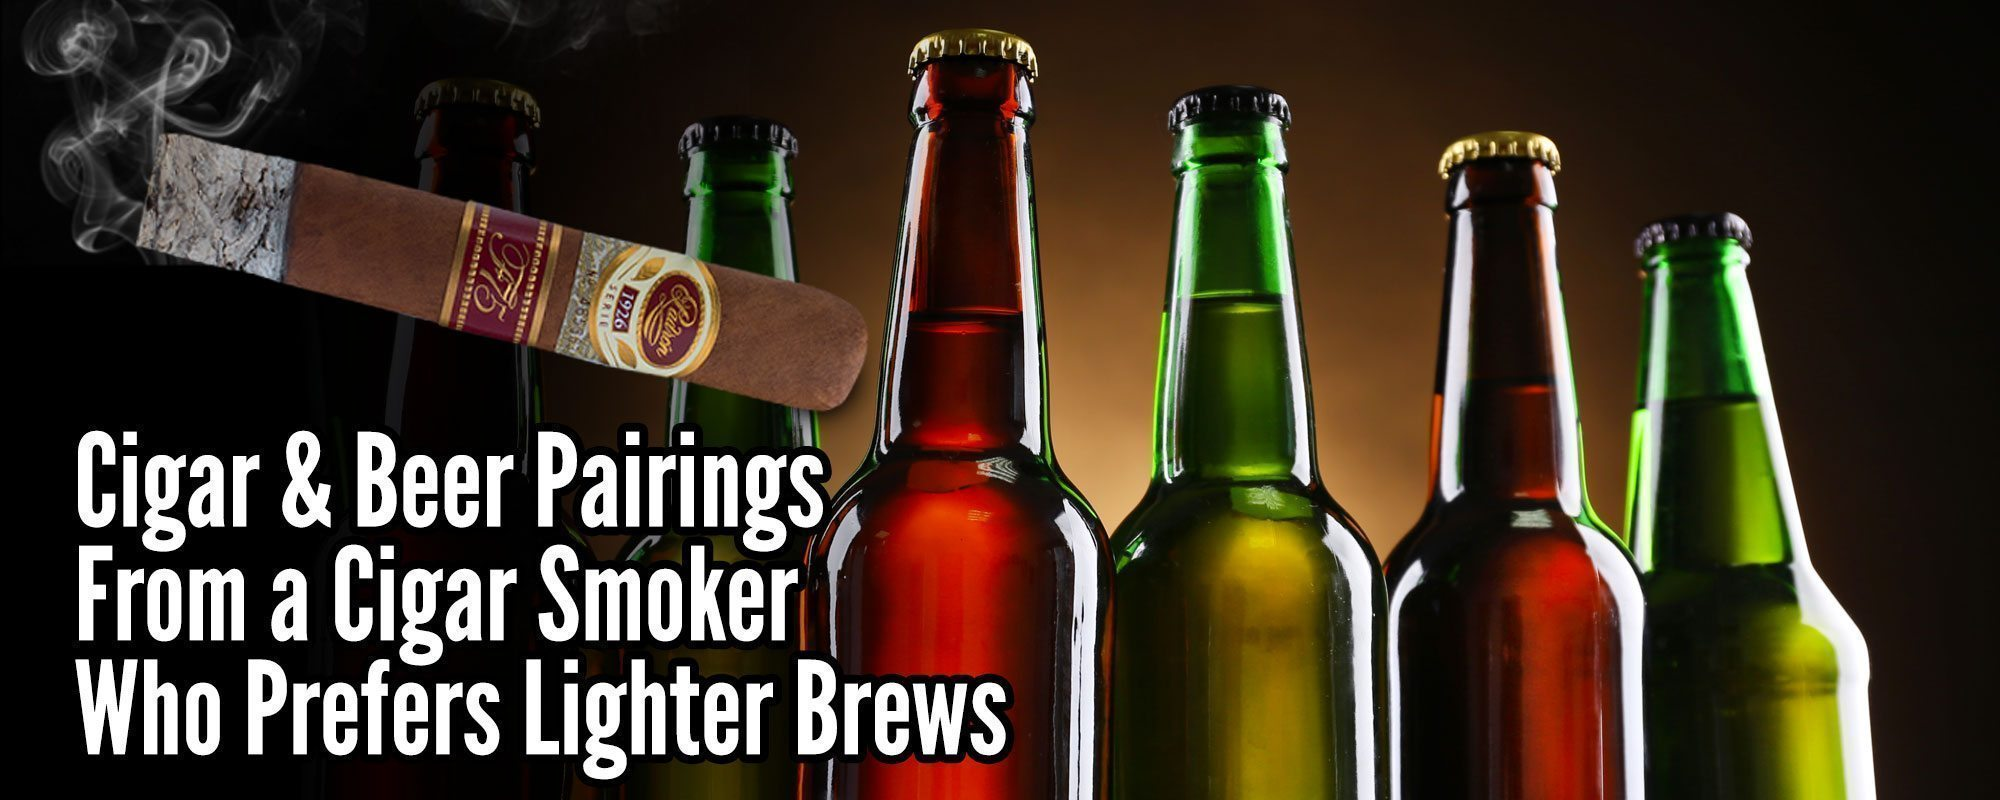 Tips & Tricks: 5 Cigar & Beer Pairings from a Cigar Smoker Who Prefers Lighter Brews